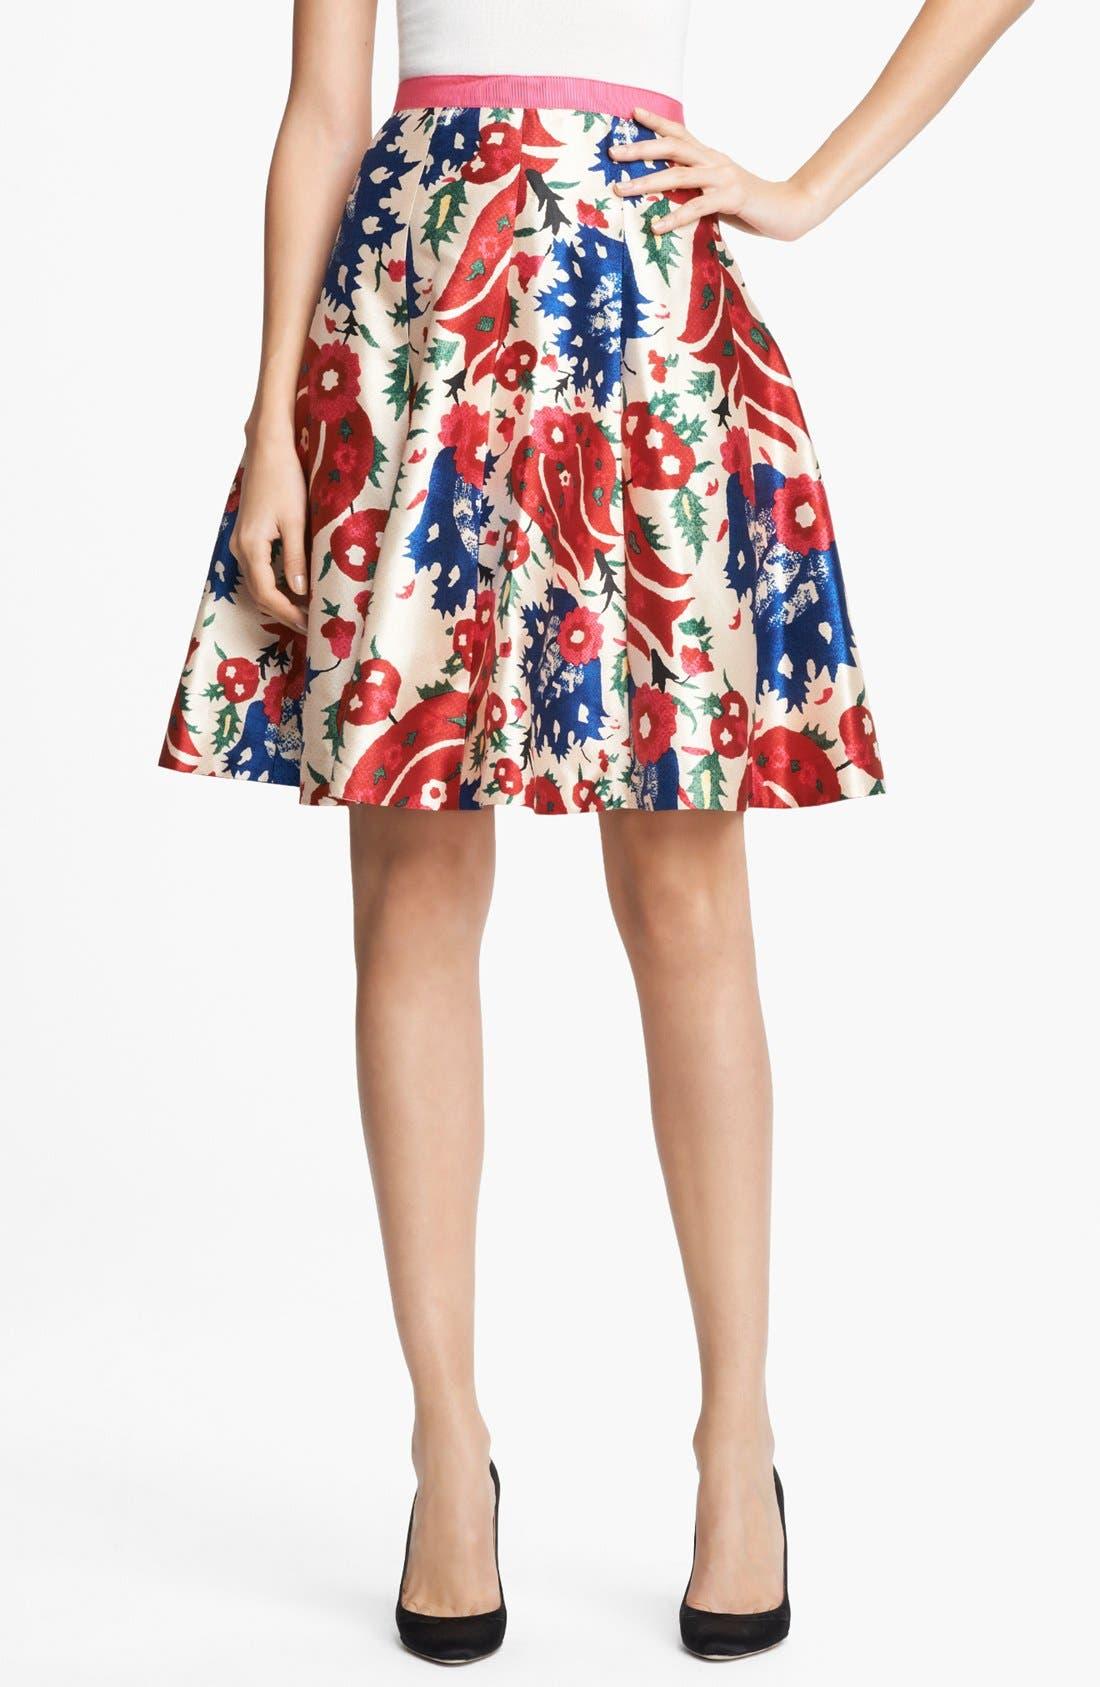 Alternate Image 1 Selected - Oscar de la Renta Floral Print Full Skirt